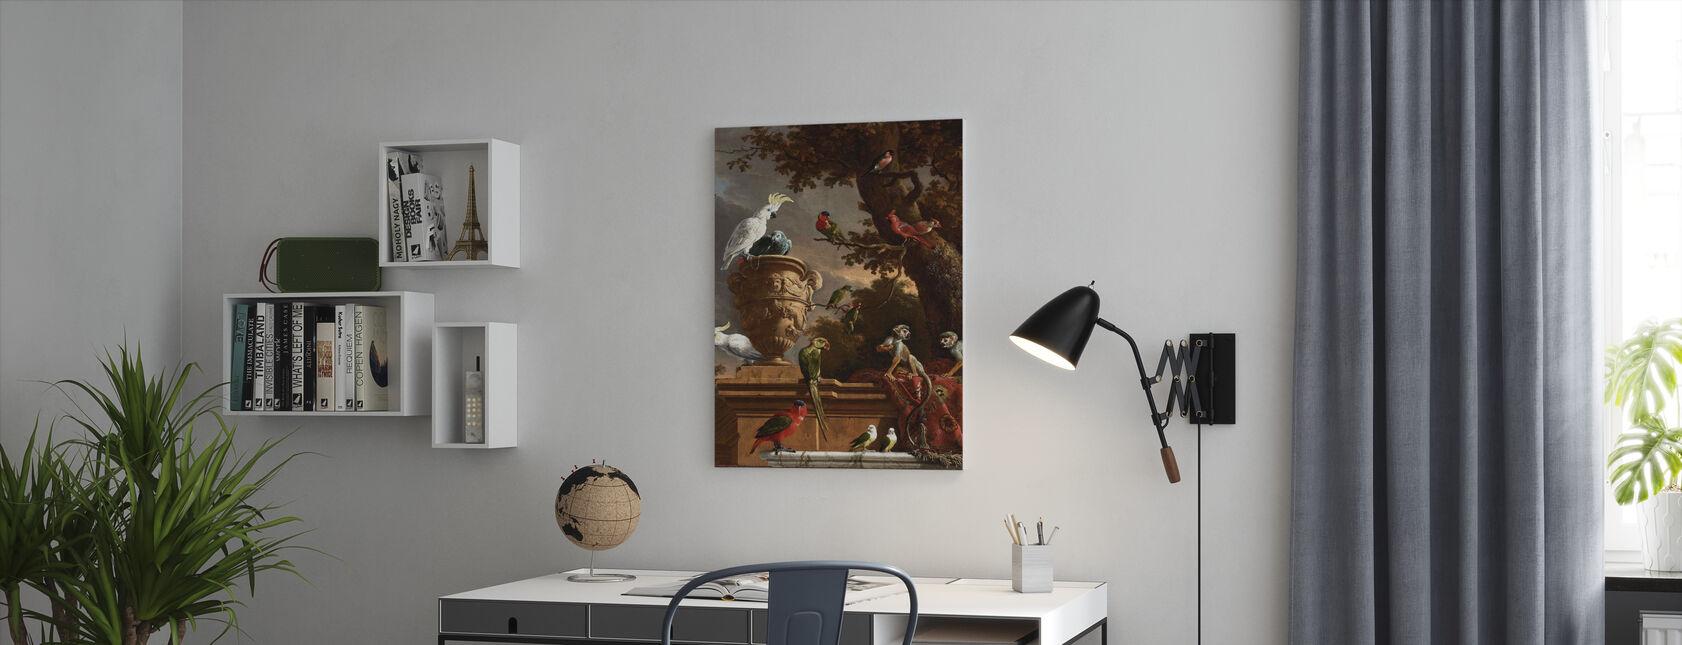 Menagerie - Melchior D'Hondecoeter - Canvas print - Kantoor